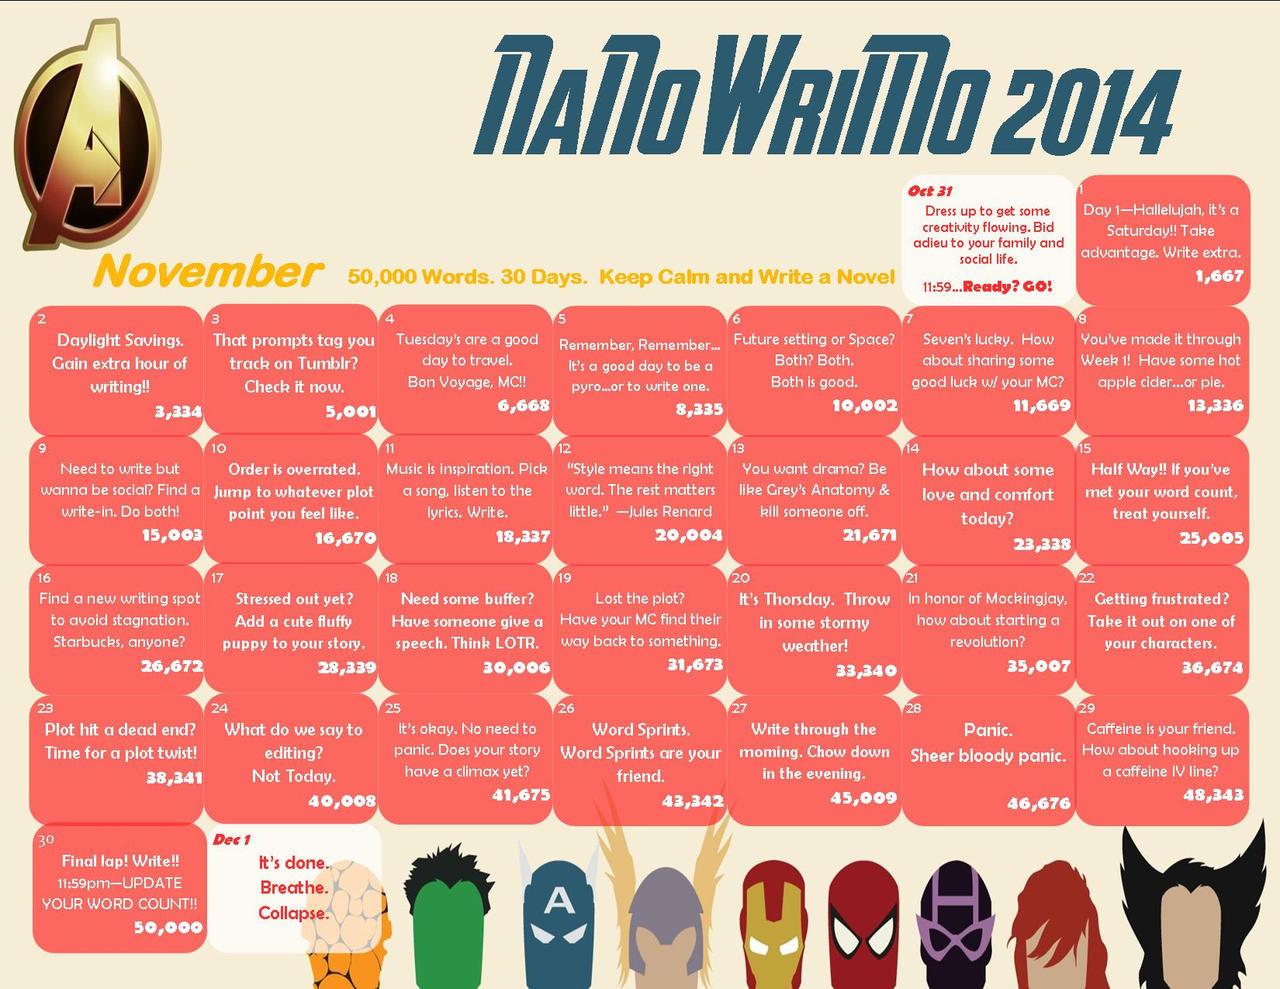 NaNoWriMo 2014 avengers by WalkingInDarkness737